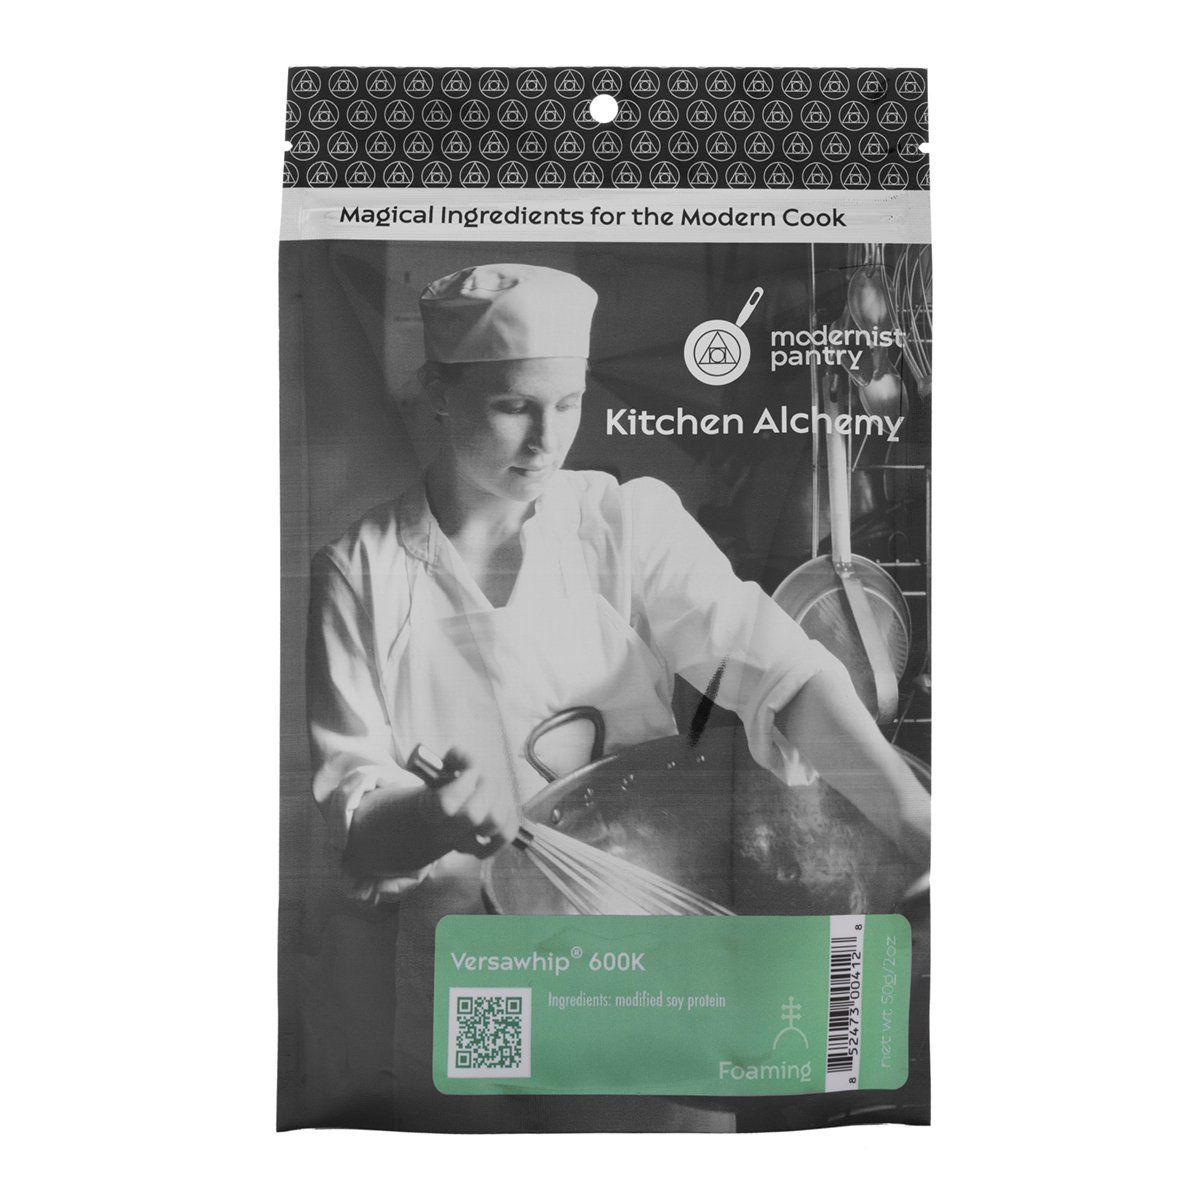 Amazon.com : Food Grade VersaWhip® 600K (Molecular Gastronomy) - 50g/2oz : Gelatin Dessert Mixes : Grocery & Gourmet Food